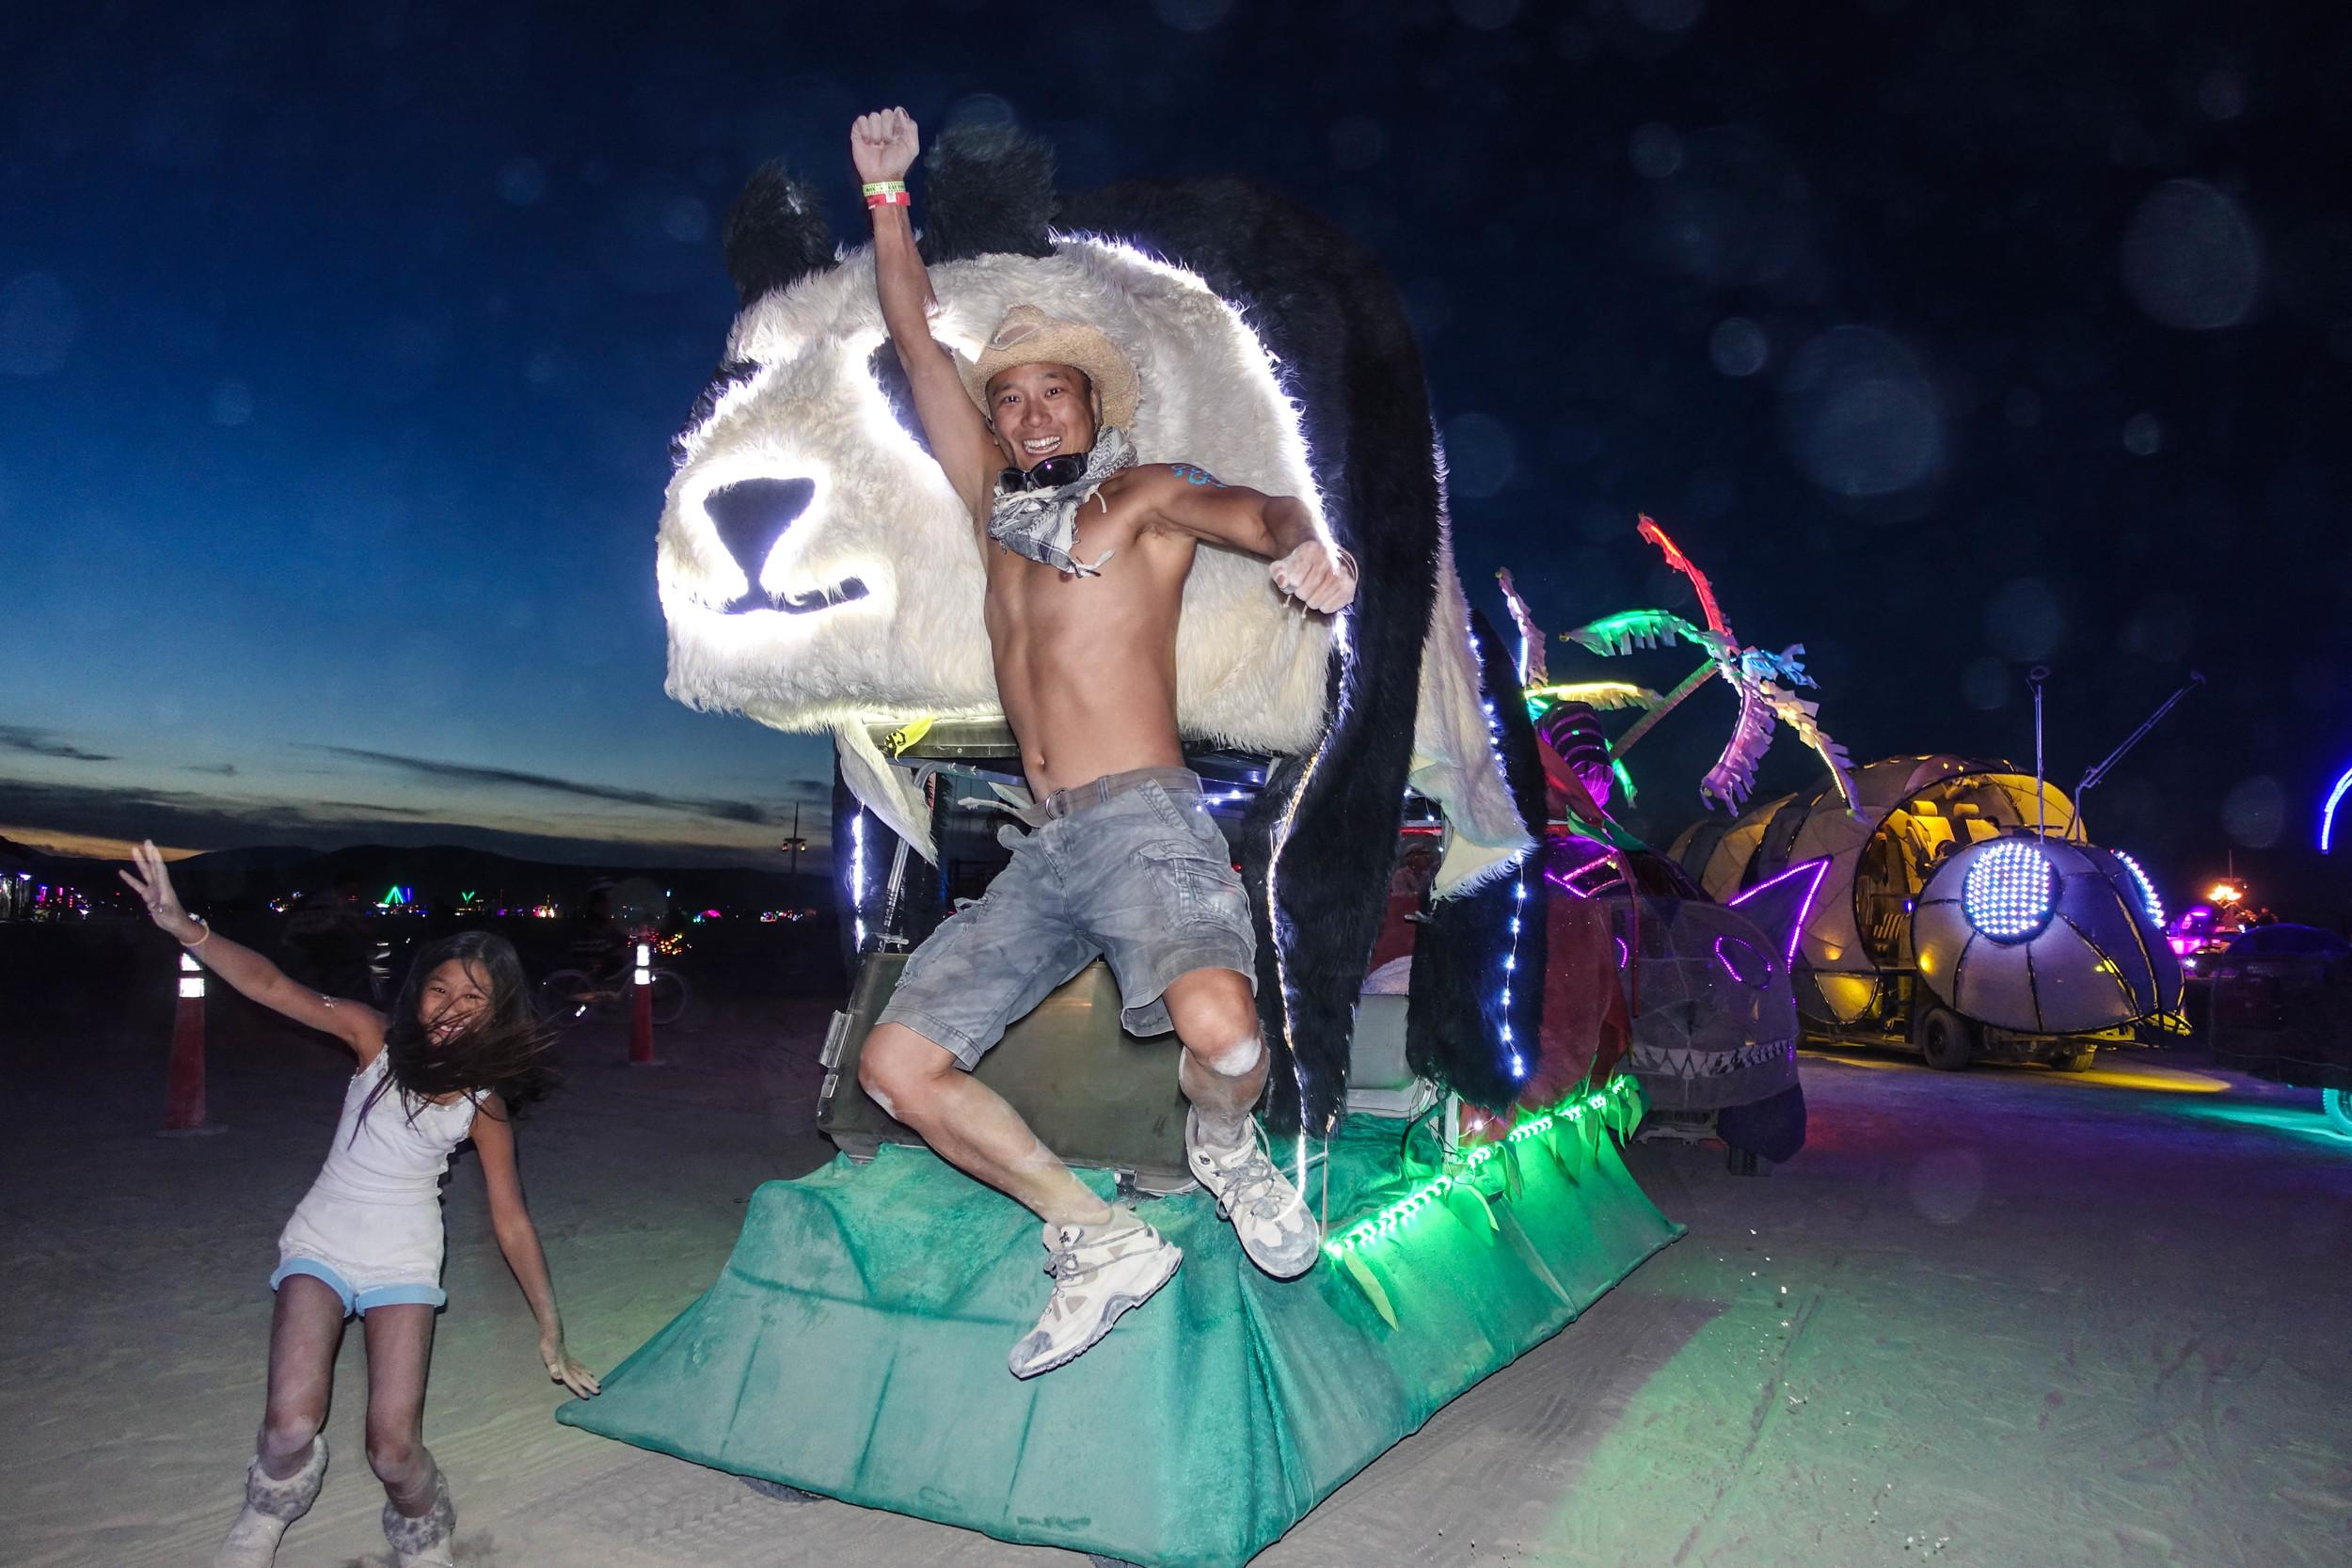 2015 Burning Man: Jamie, Eric and Derpy Version 2.0